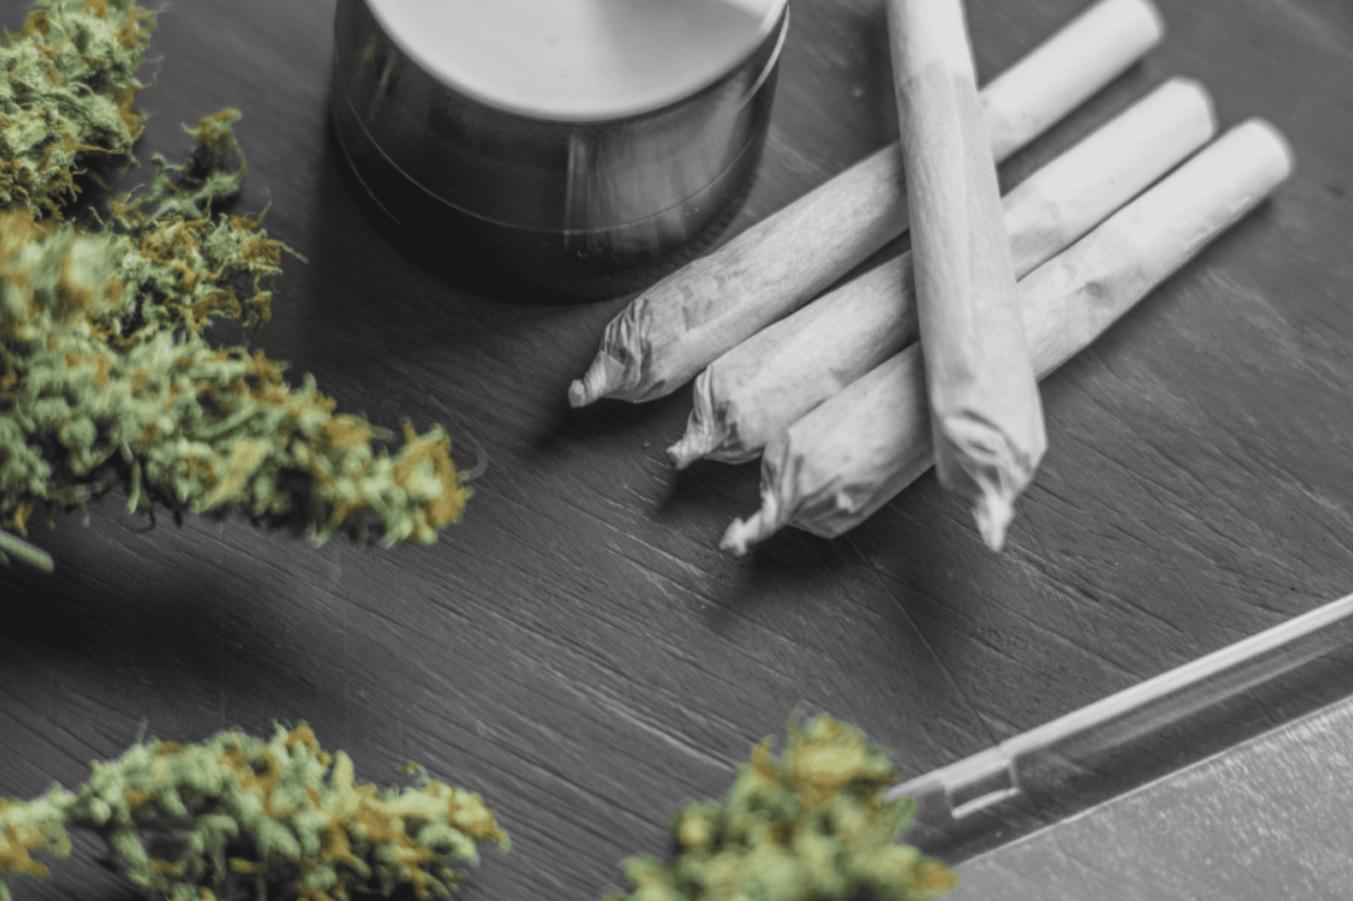 CBD jointy, CBD cigarety, CBD brko, CBD joint, CBD cigareta